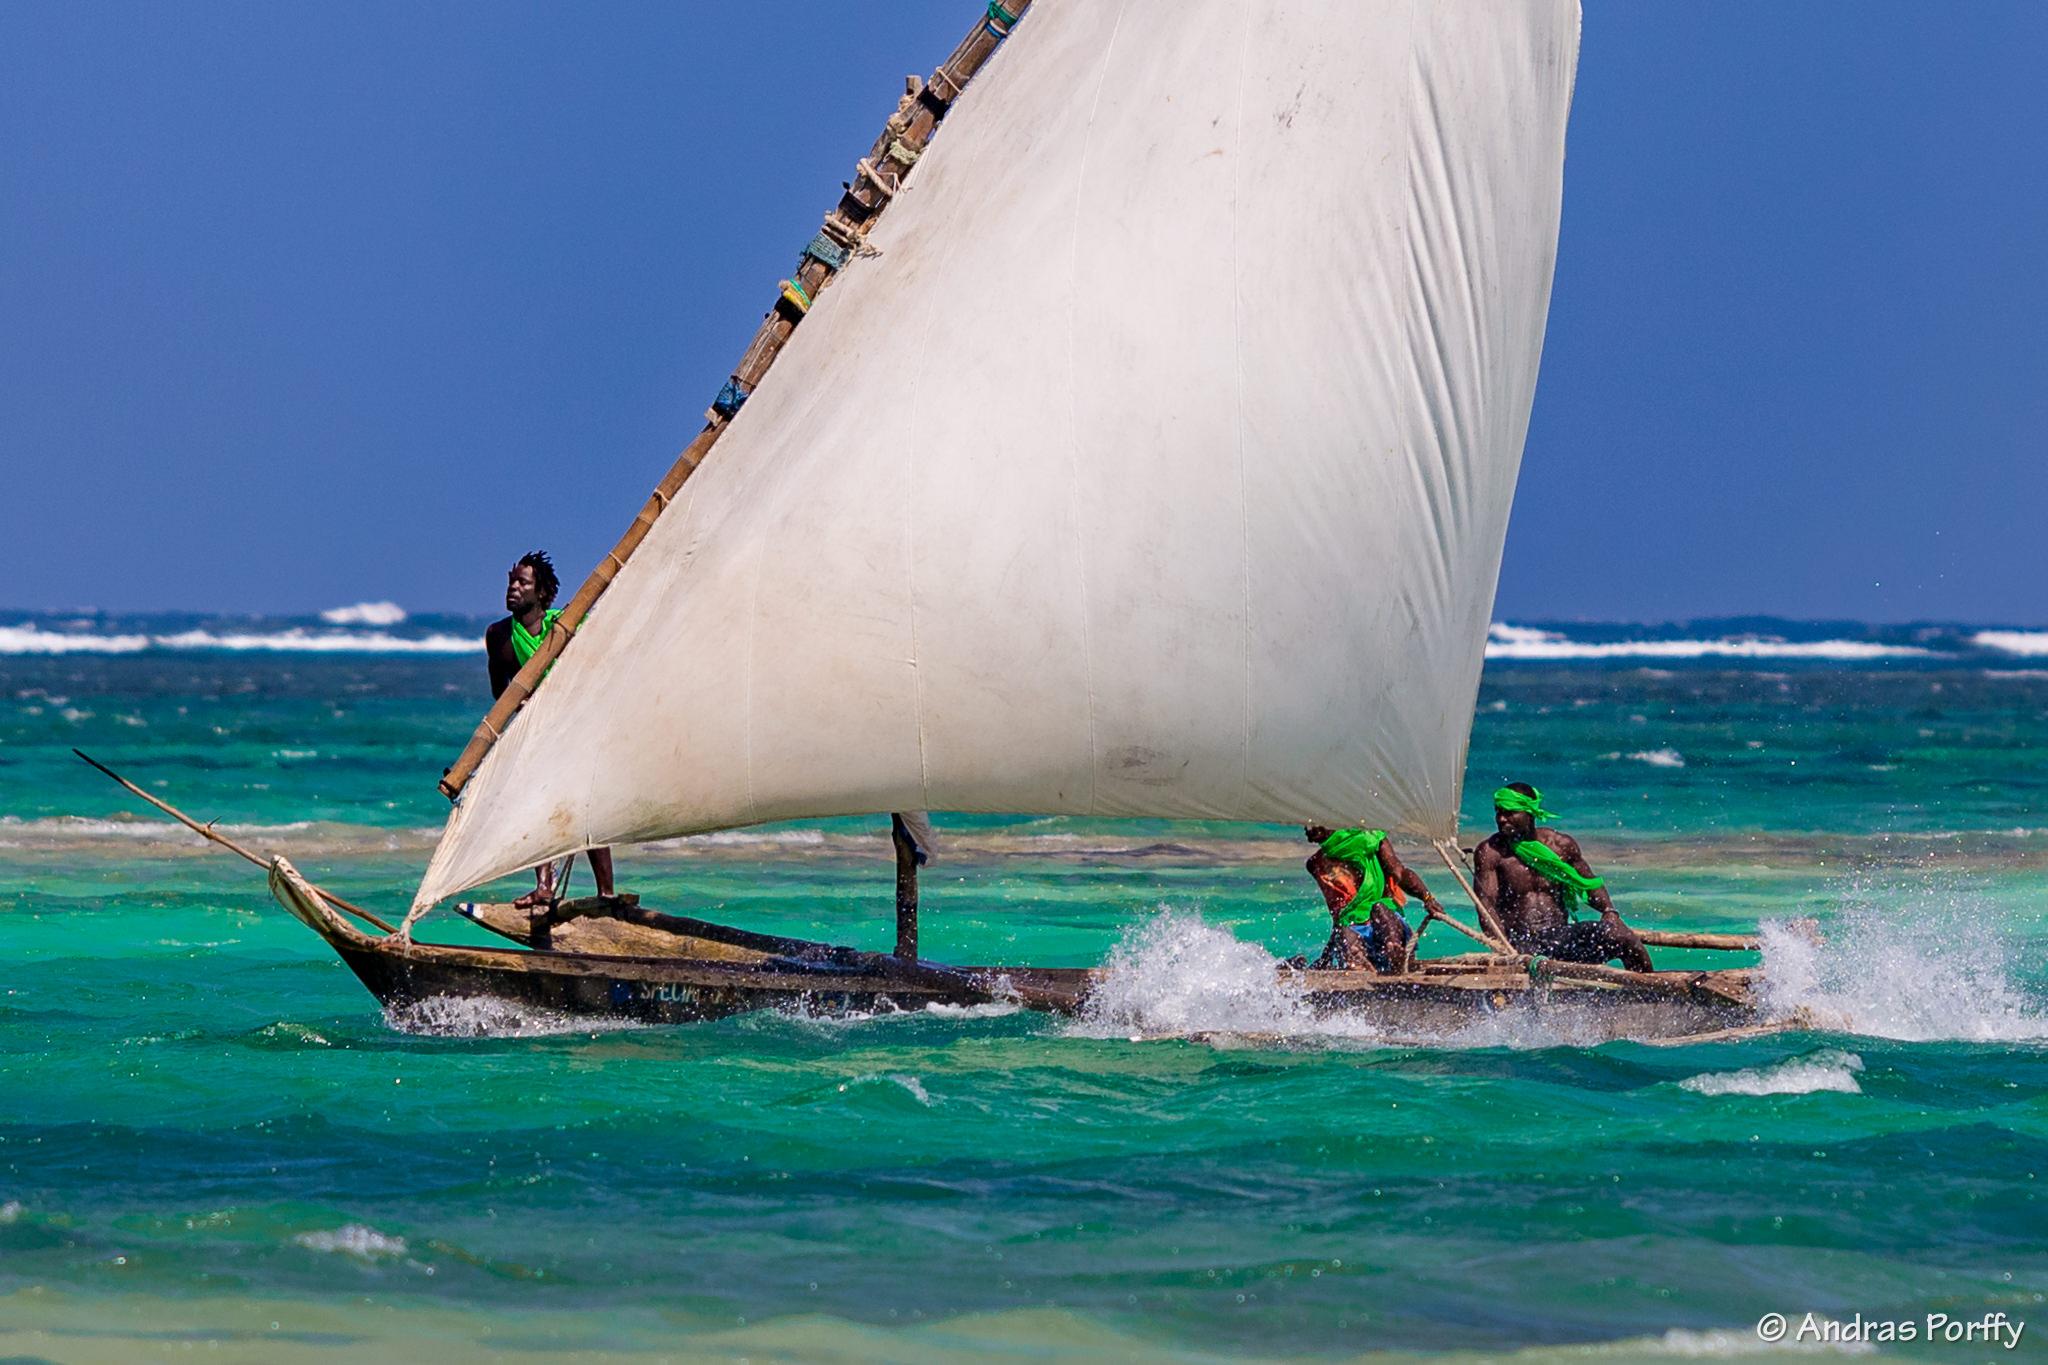 Green boat on wave.jpg